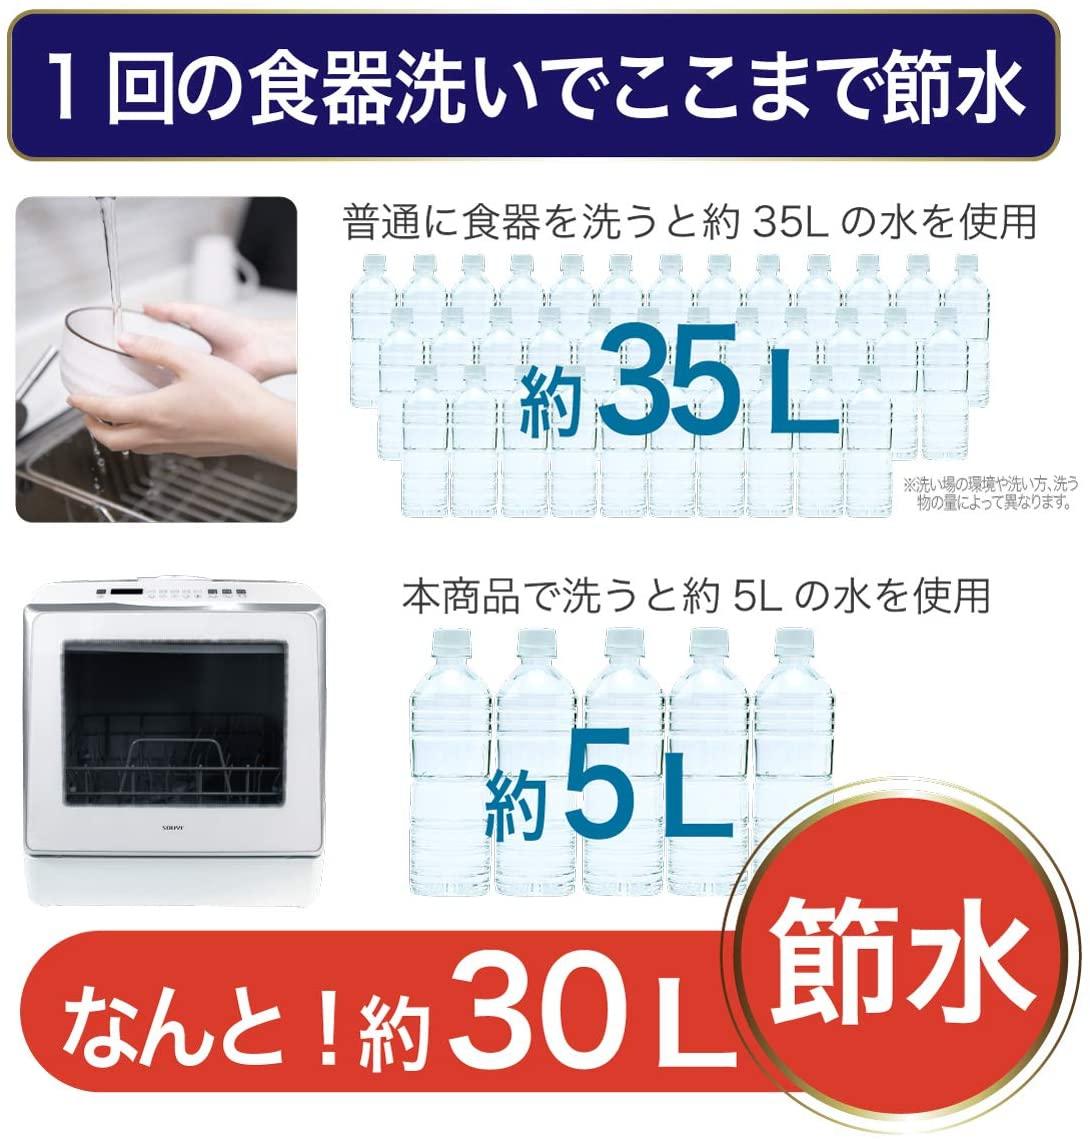 SOUYI(ソウイ) 食器洗い乾燥機 SY-118の商品画像6